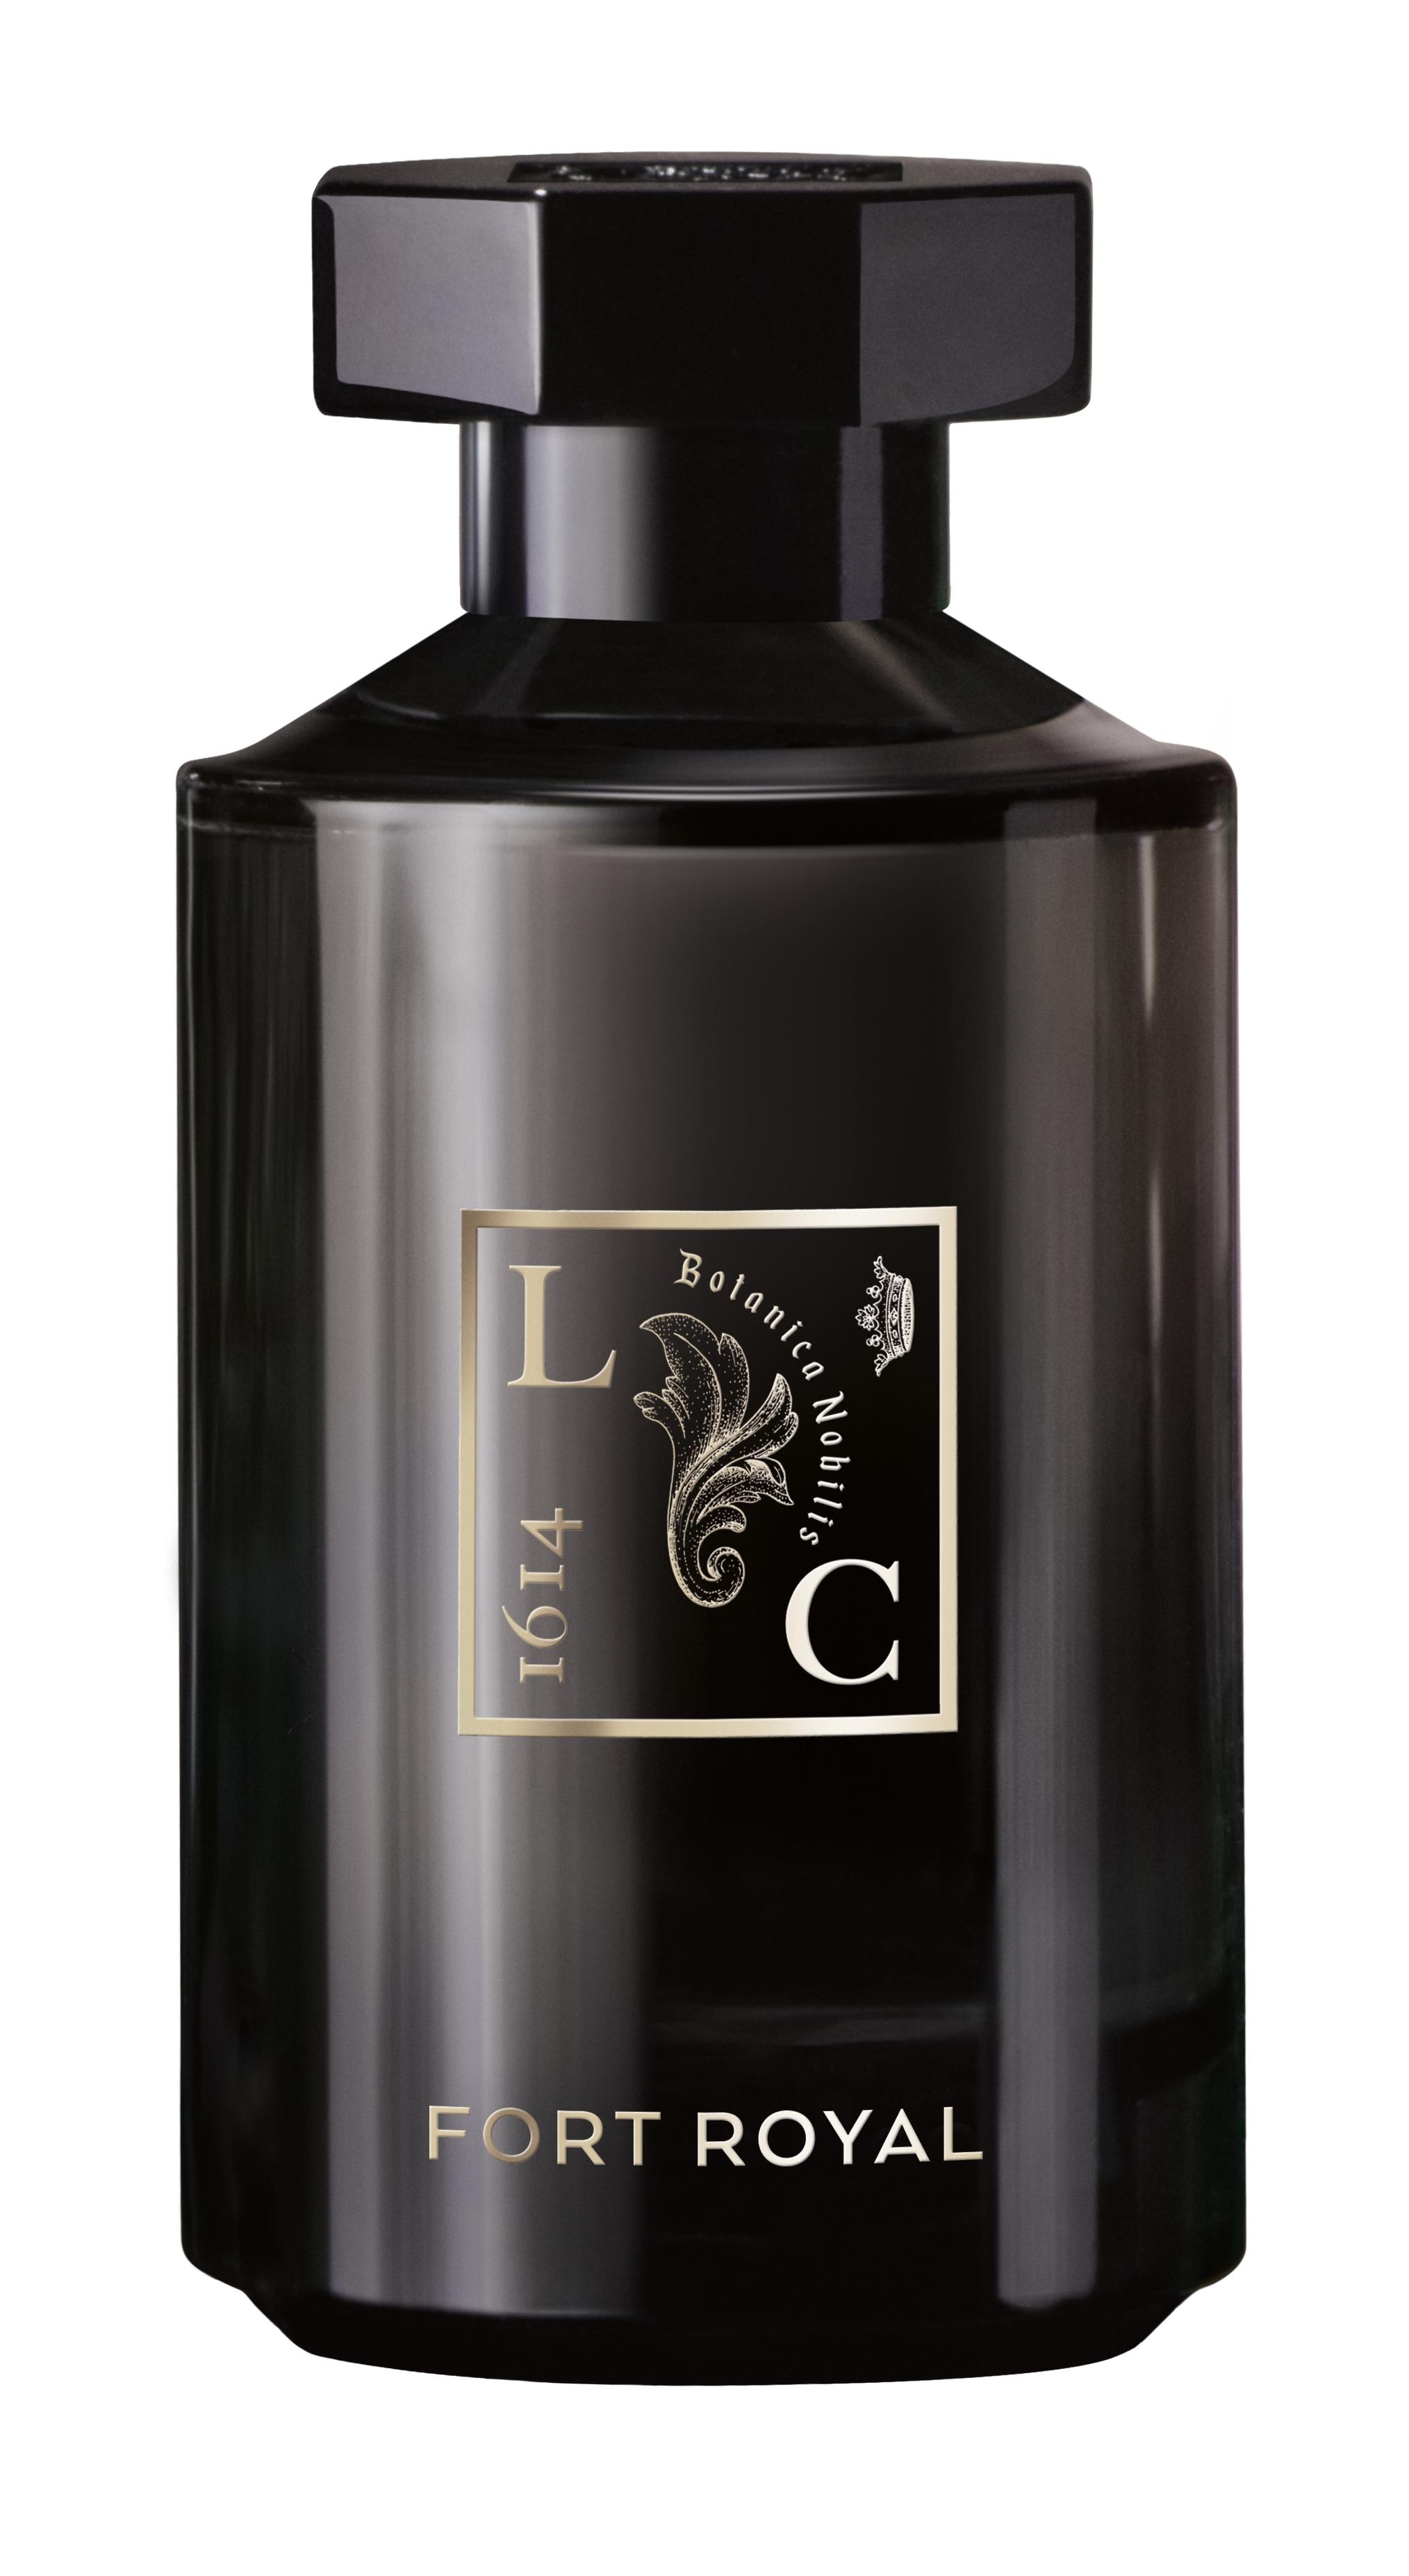 Remarkable Perfume Fort Royal Edp